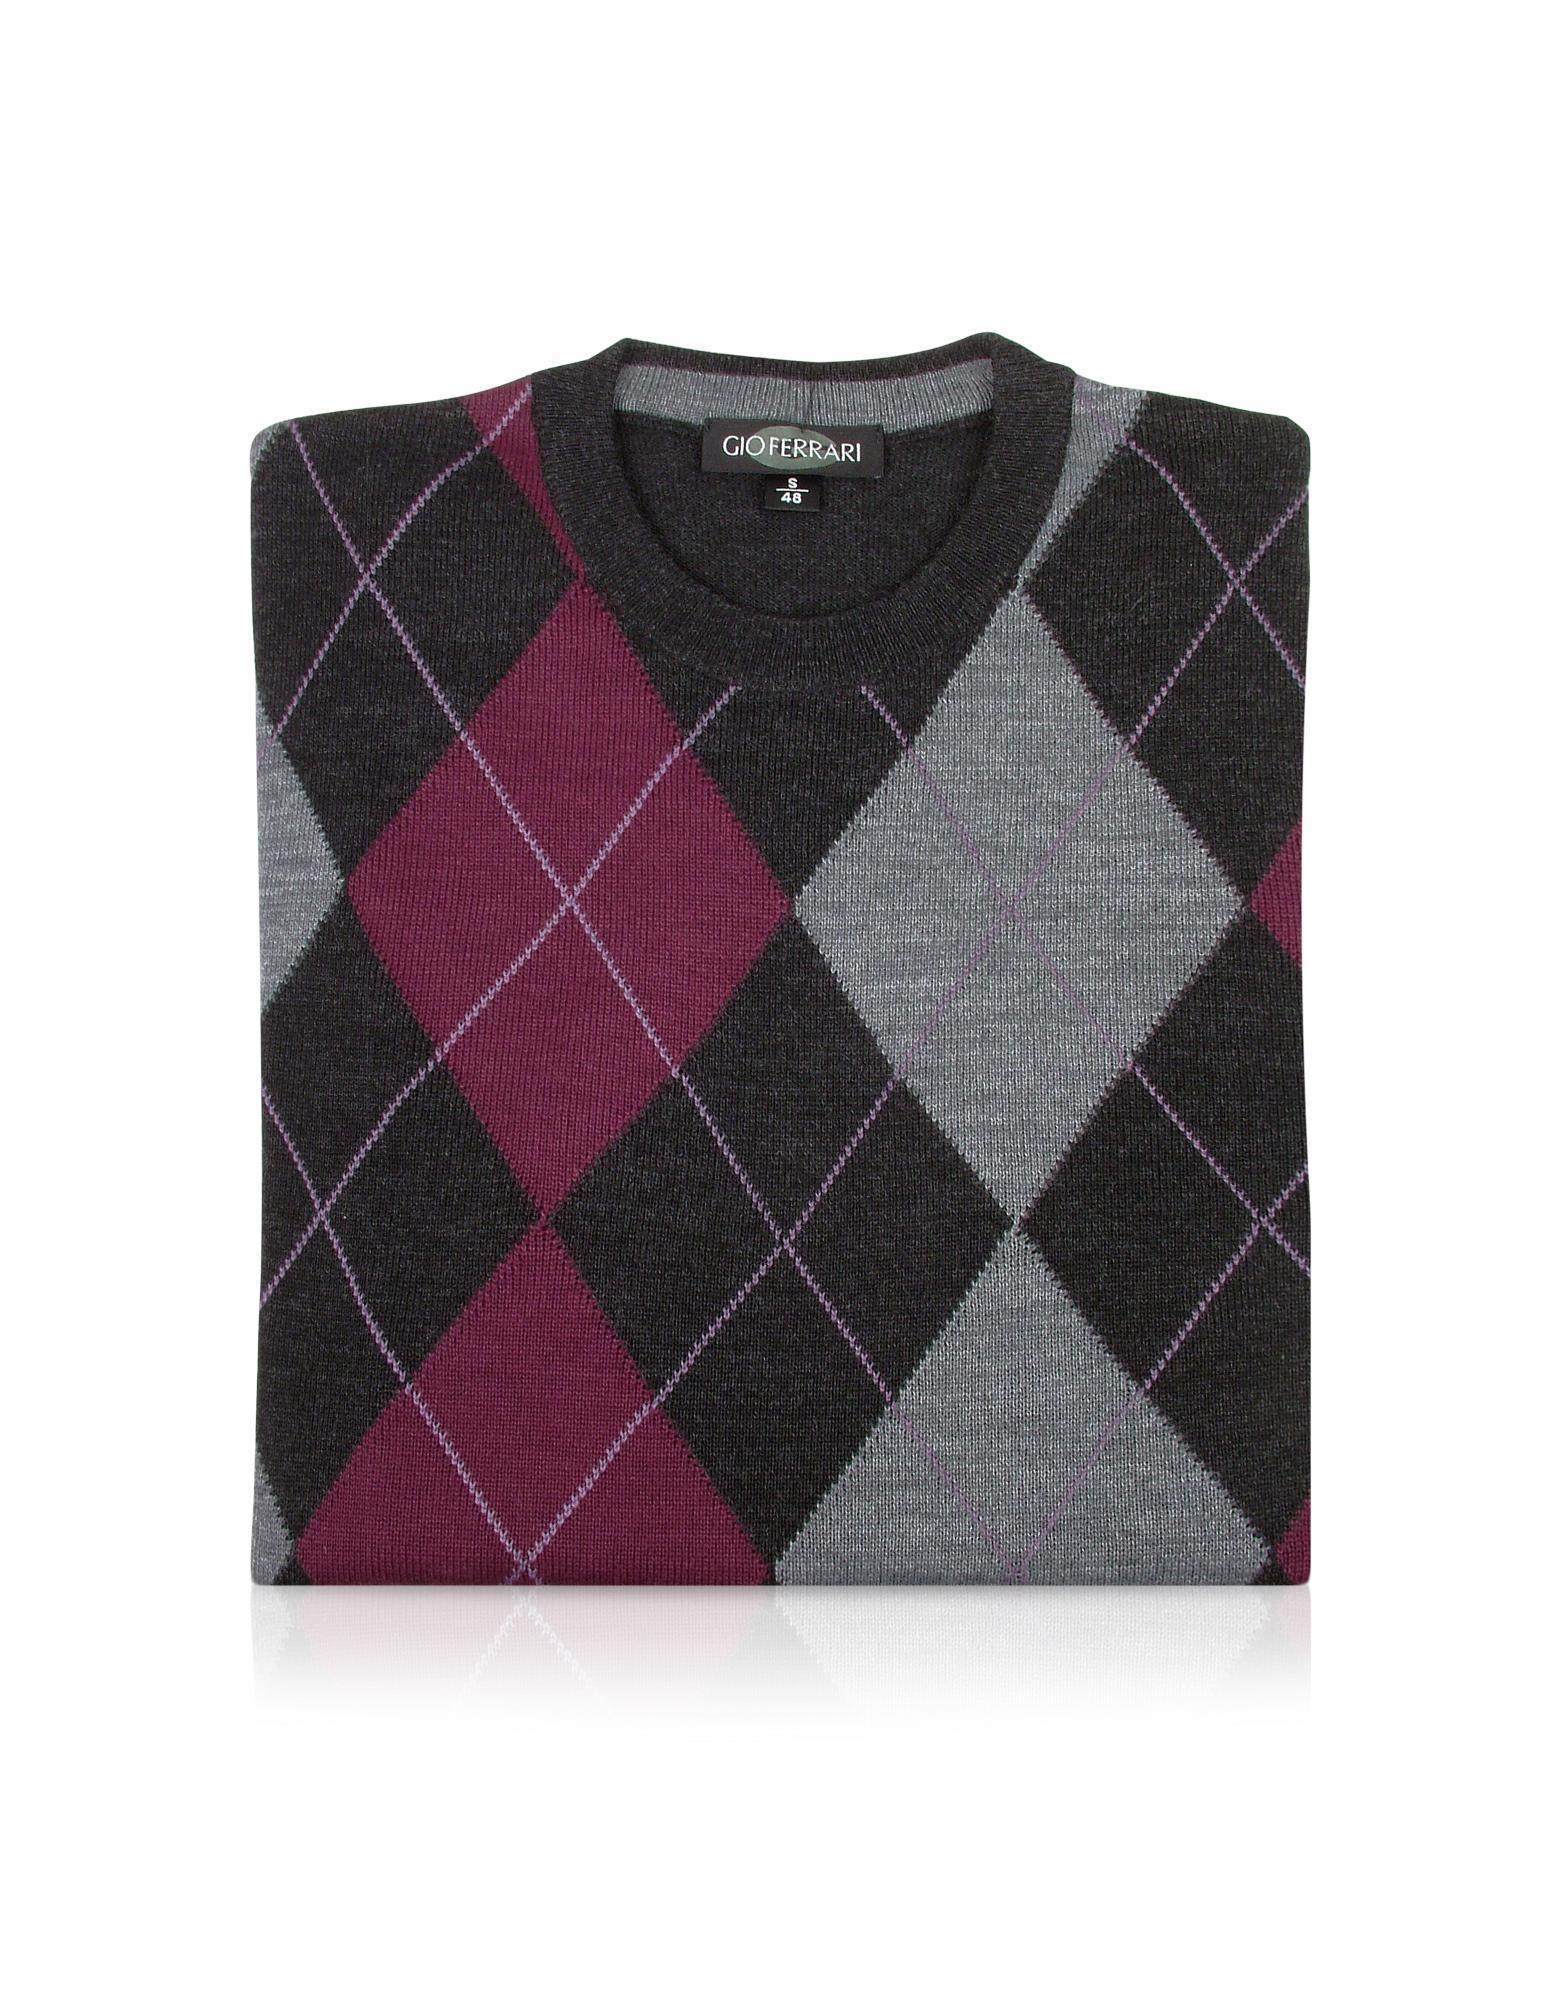 Gio Ferrari Herrensweater aus Wolle mit Rautenmuster